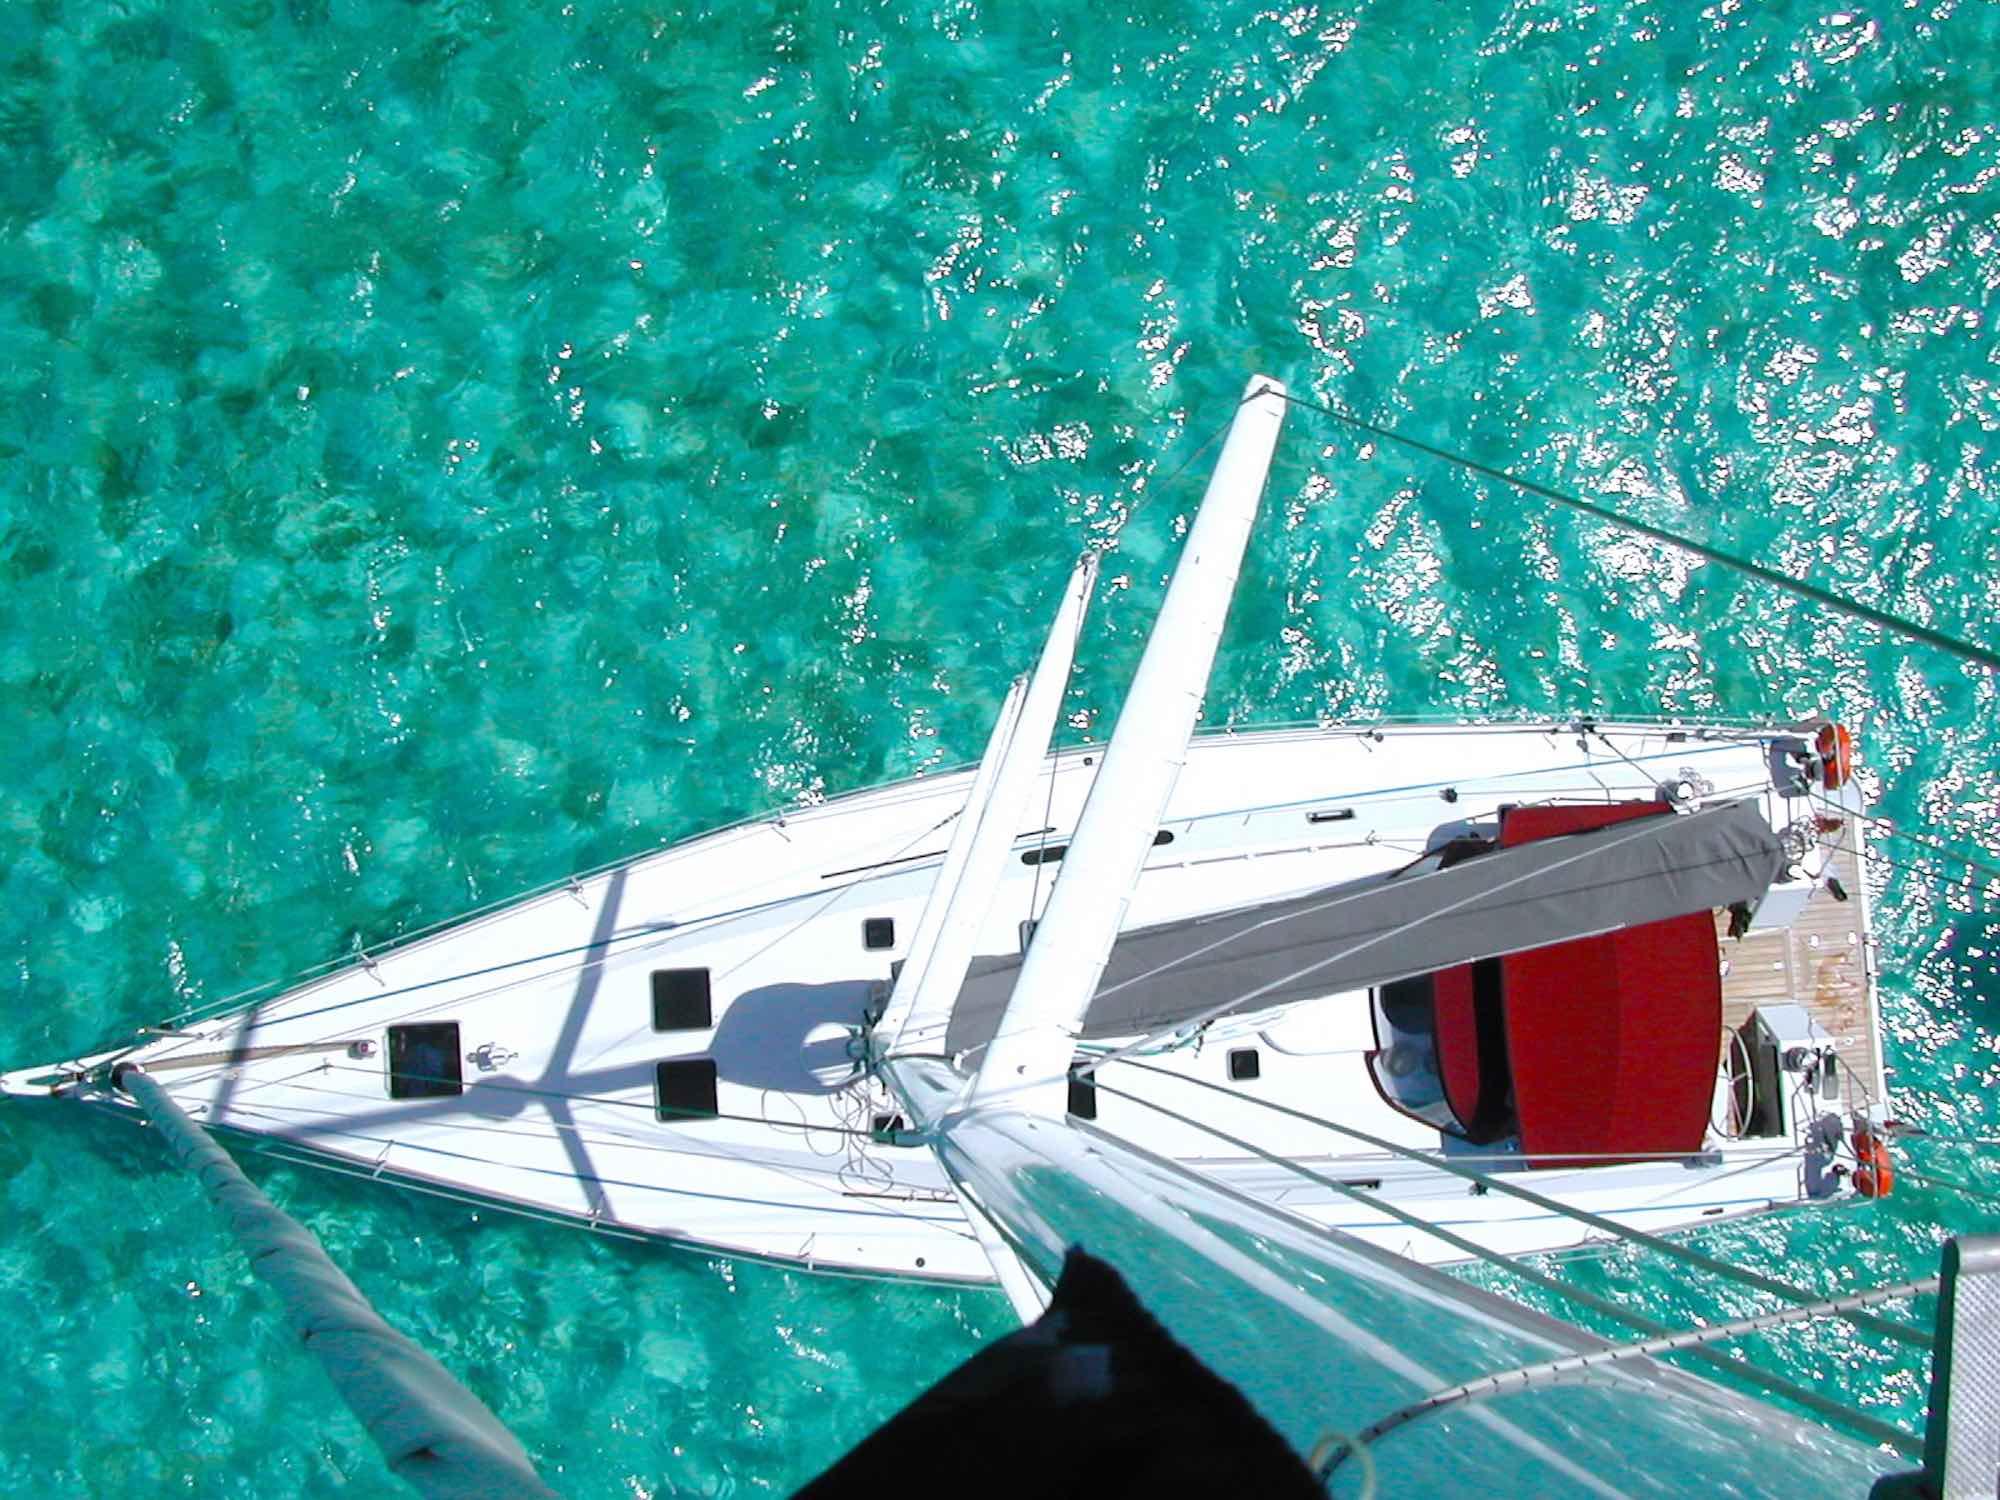 Dalai yacht deck view islands beaches Burma xs.jpeg